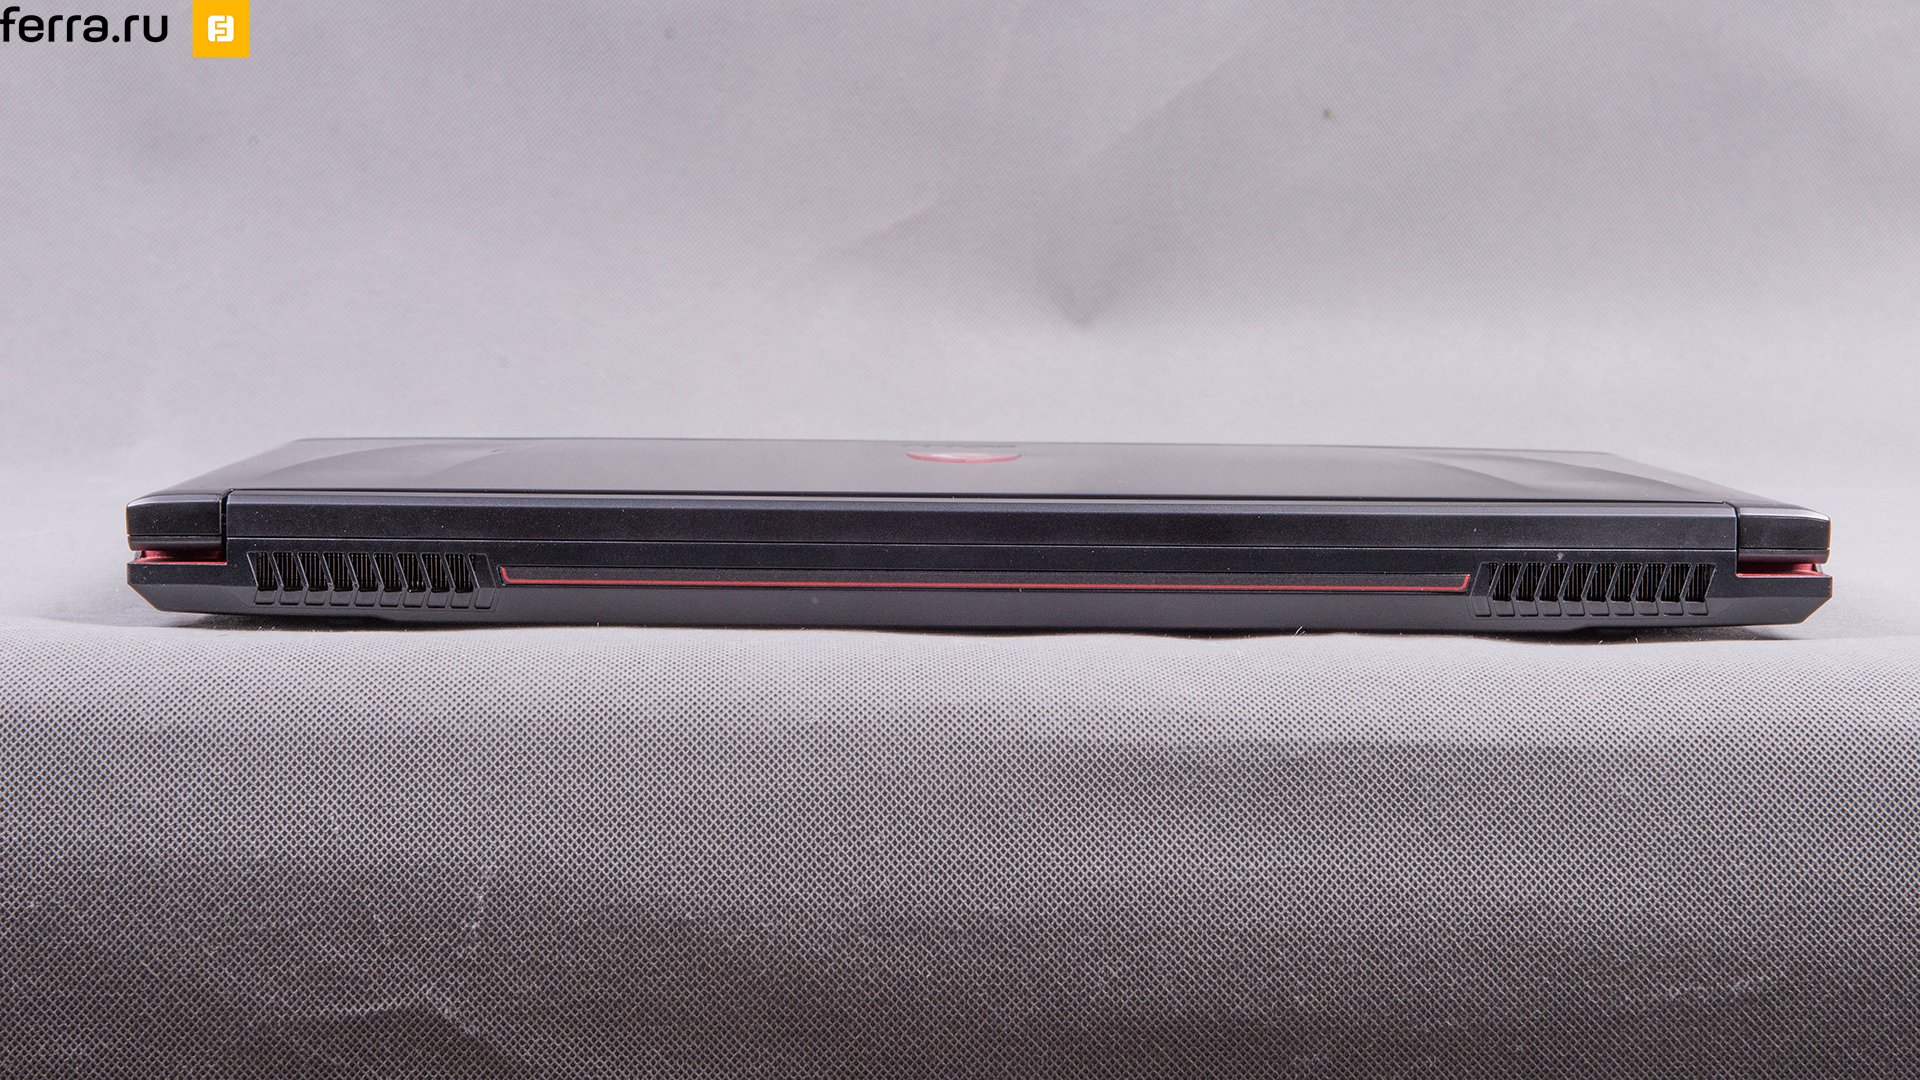 Отзывы о ноутбук msi ge72 6qf apache pro